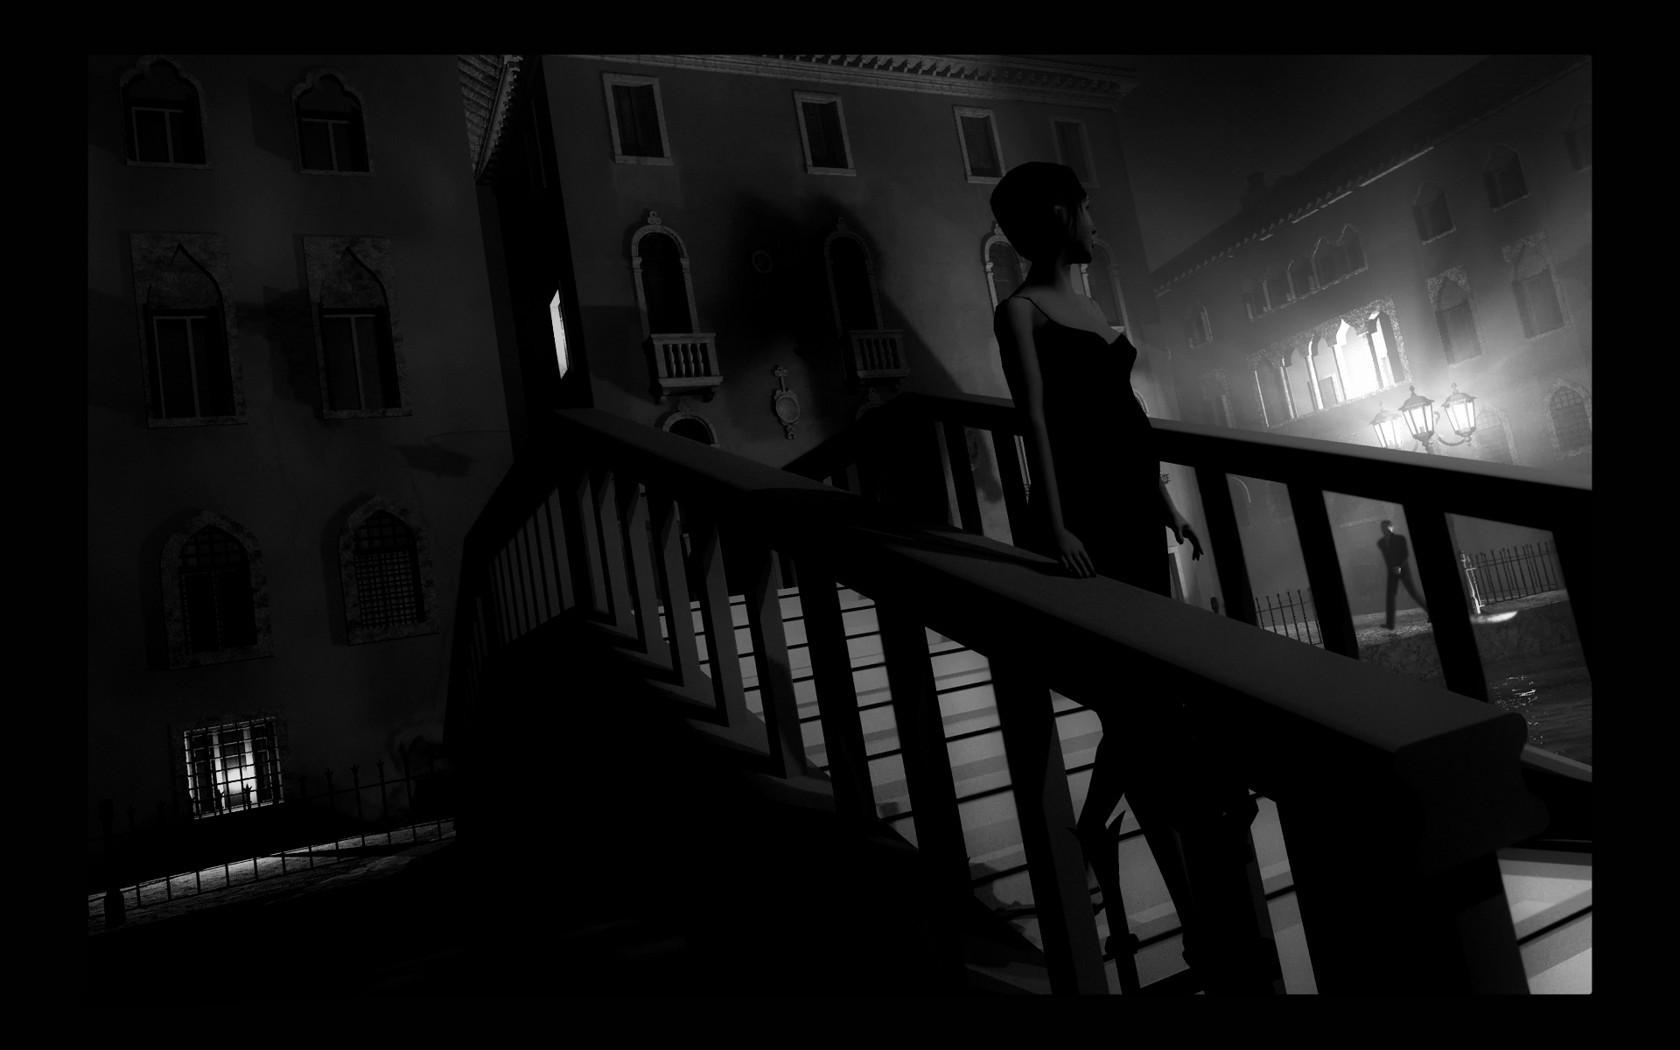 Gallery For gt Film Noir Wallpaper 1680x1050